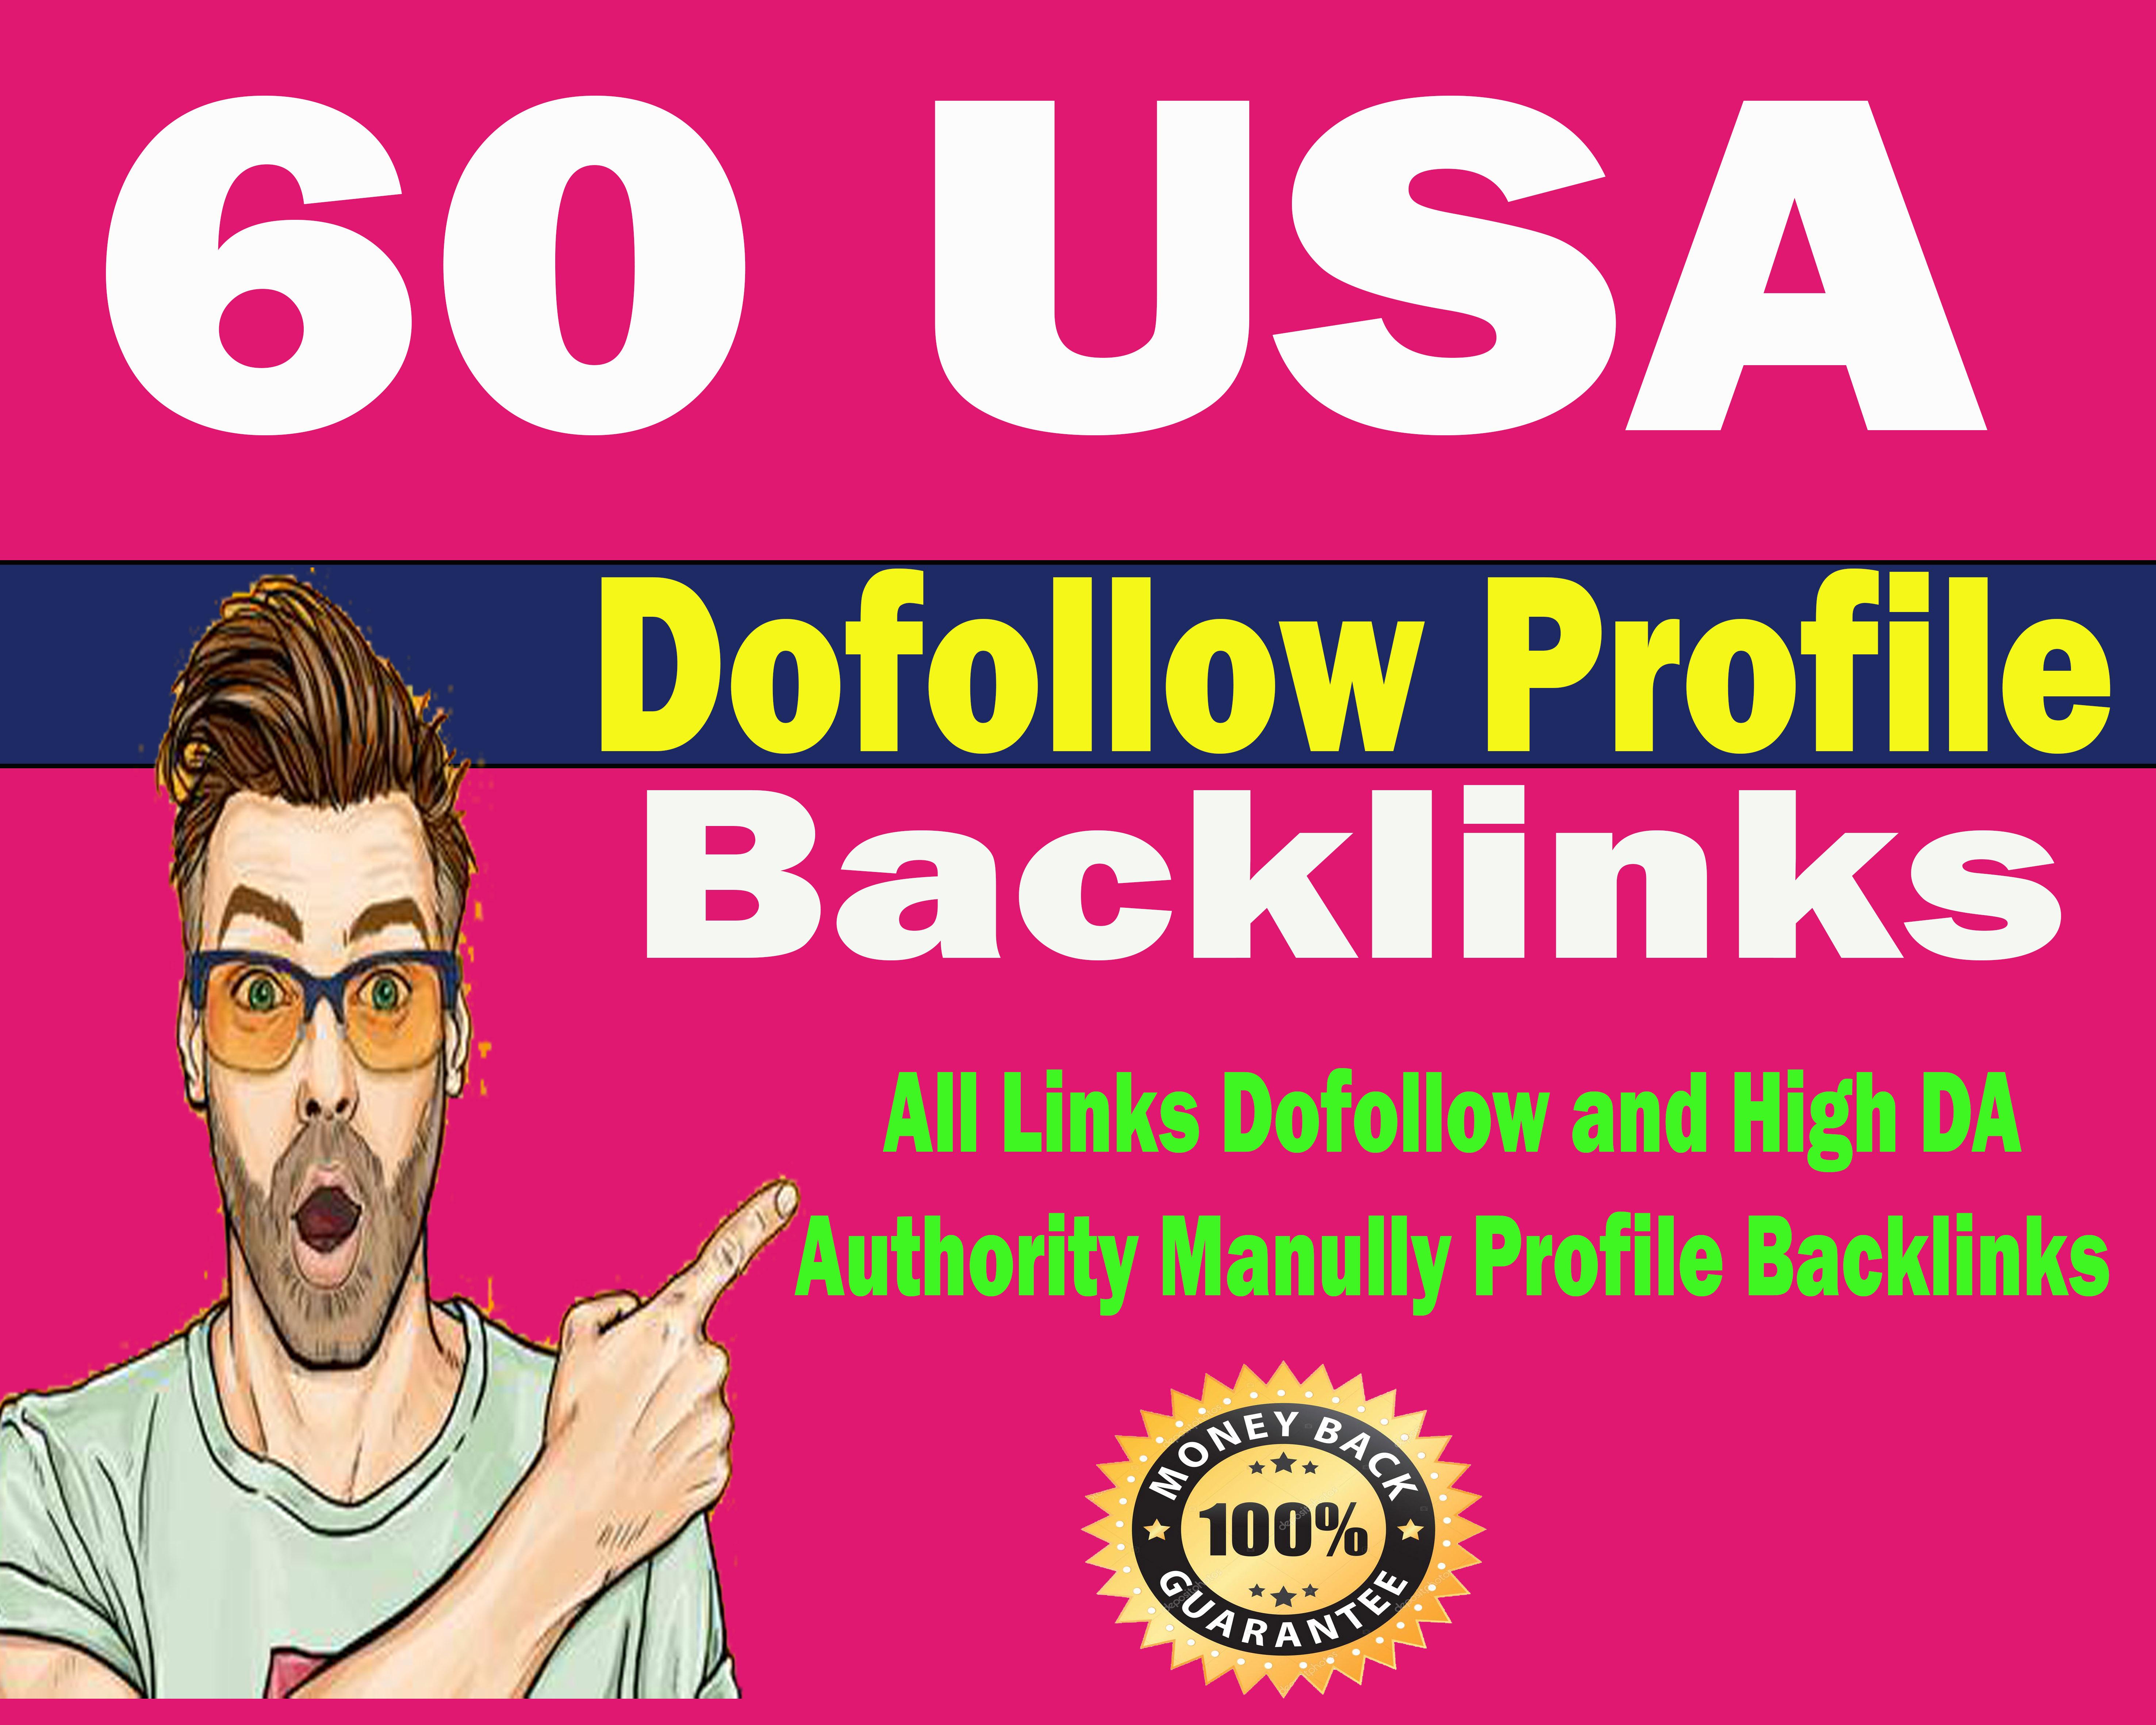 manully create 60 USA high quality dofollow profile backlinks